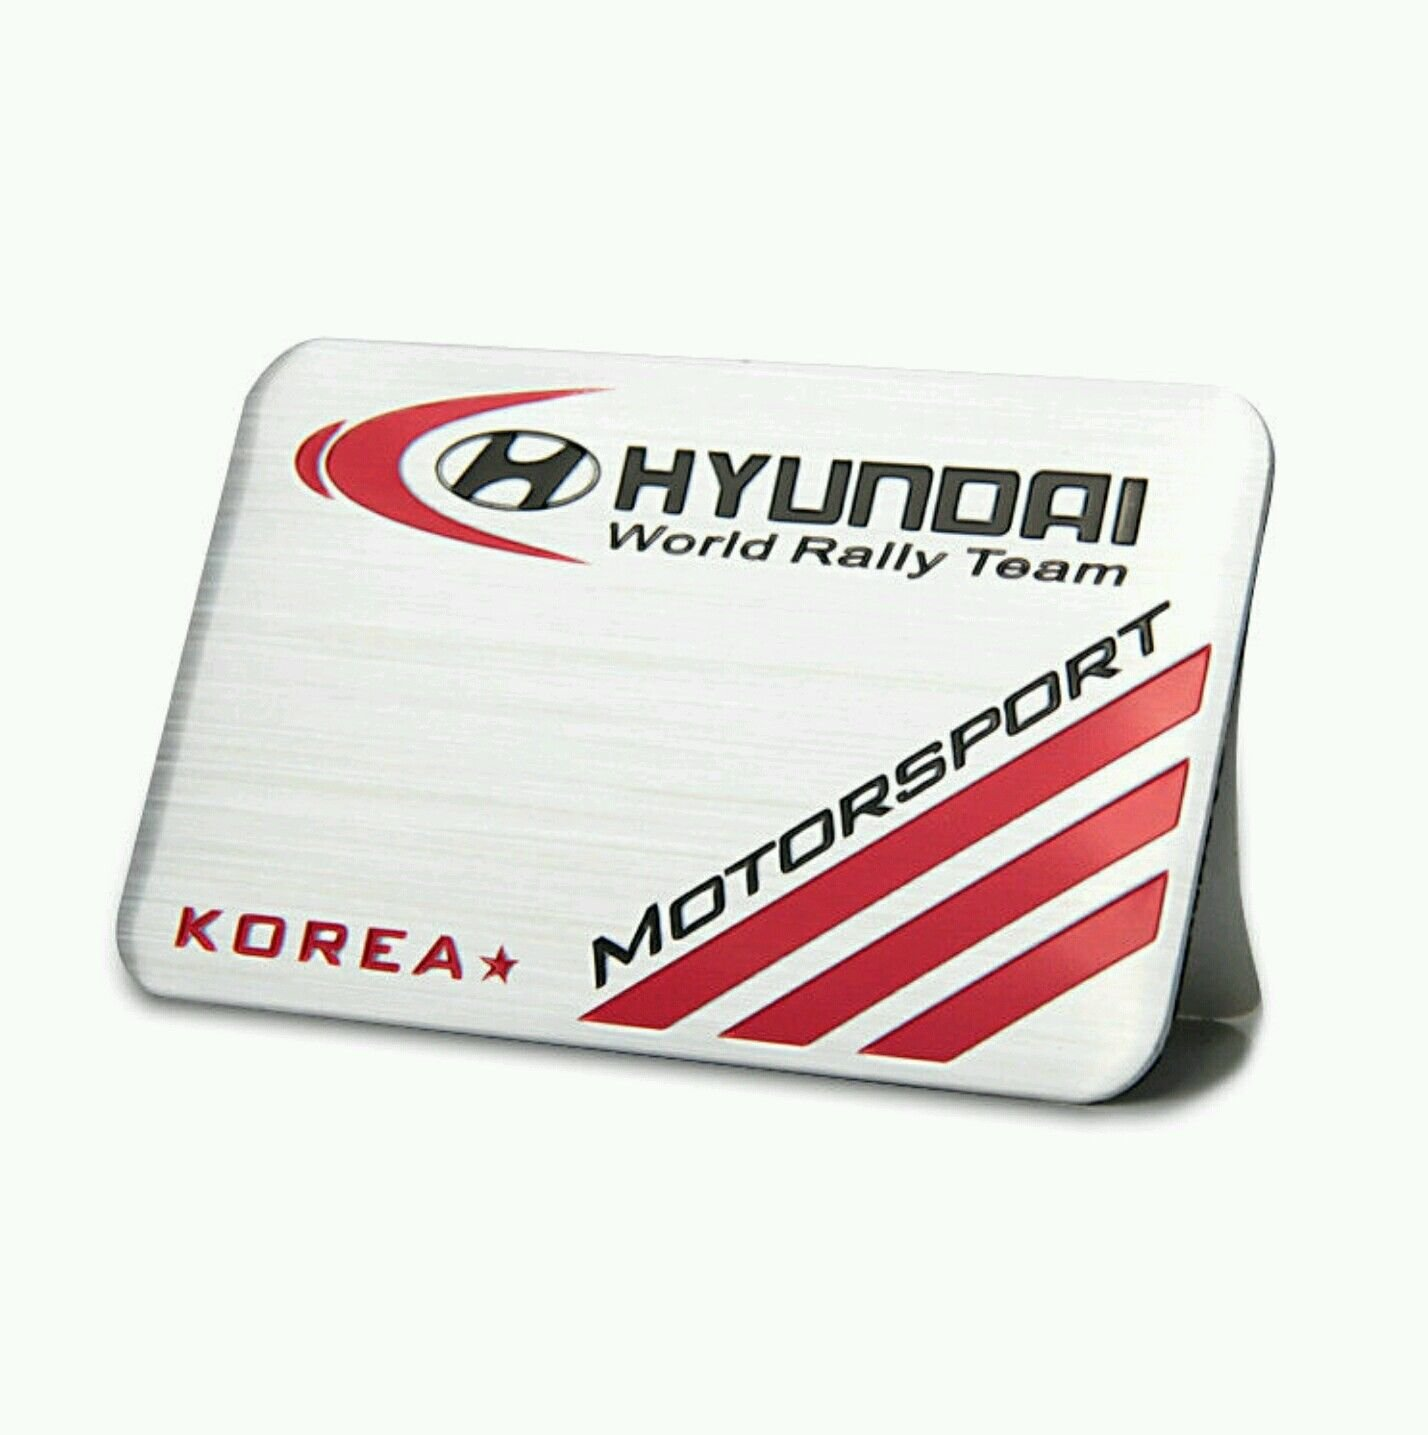 Aluminum Emblem for HYUNDAI Motorsport Korea Limited Edition